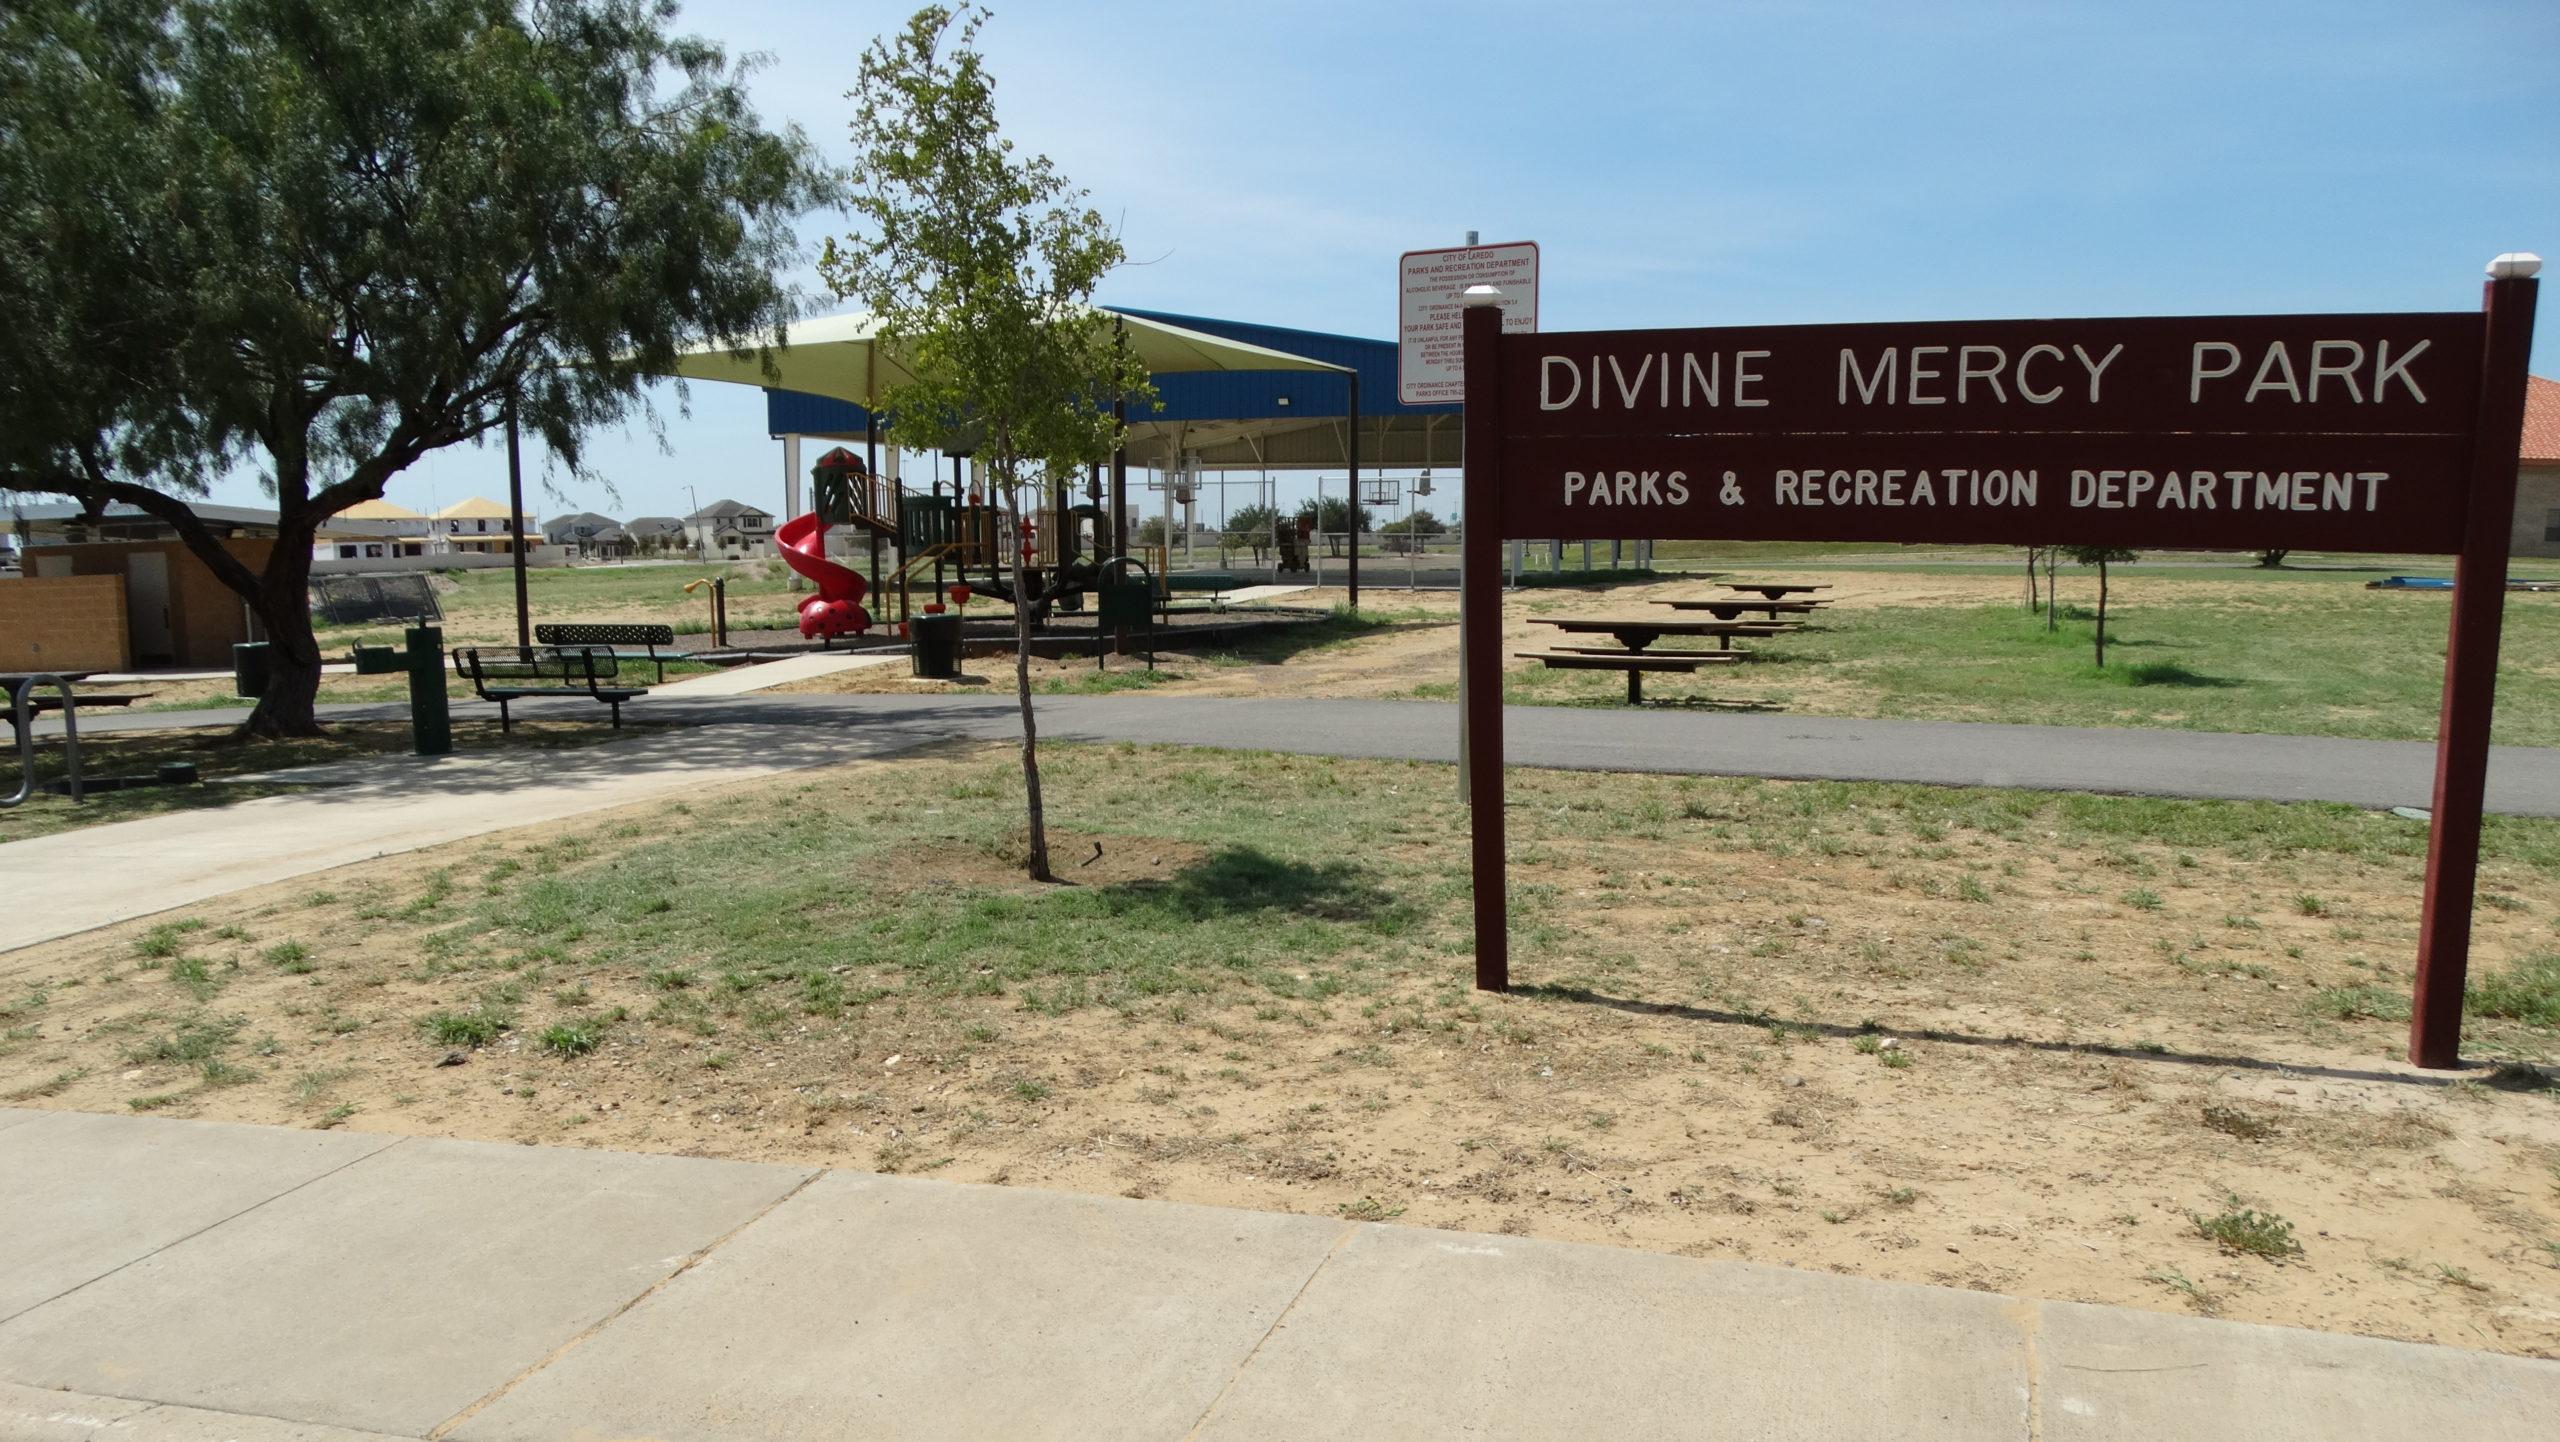 Divine Mercy Park